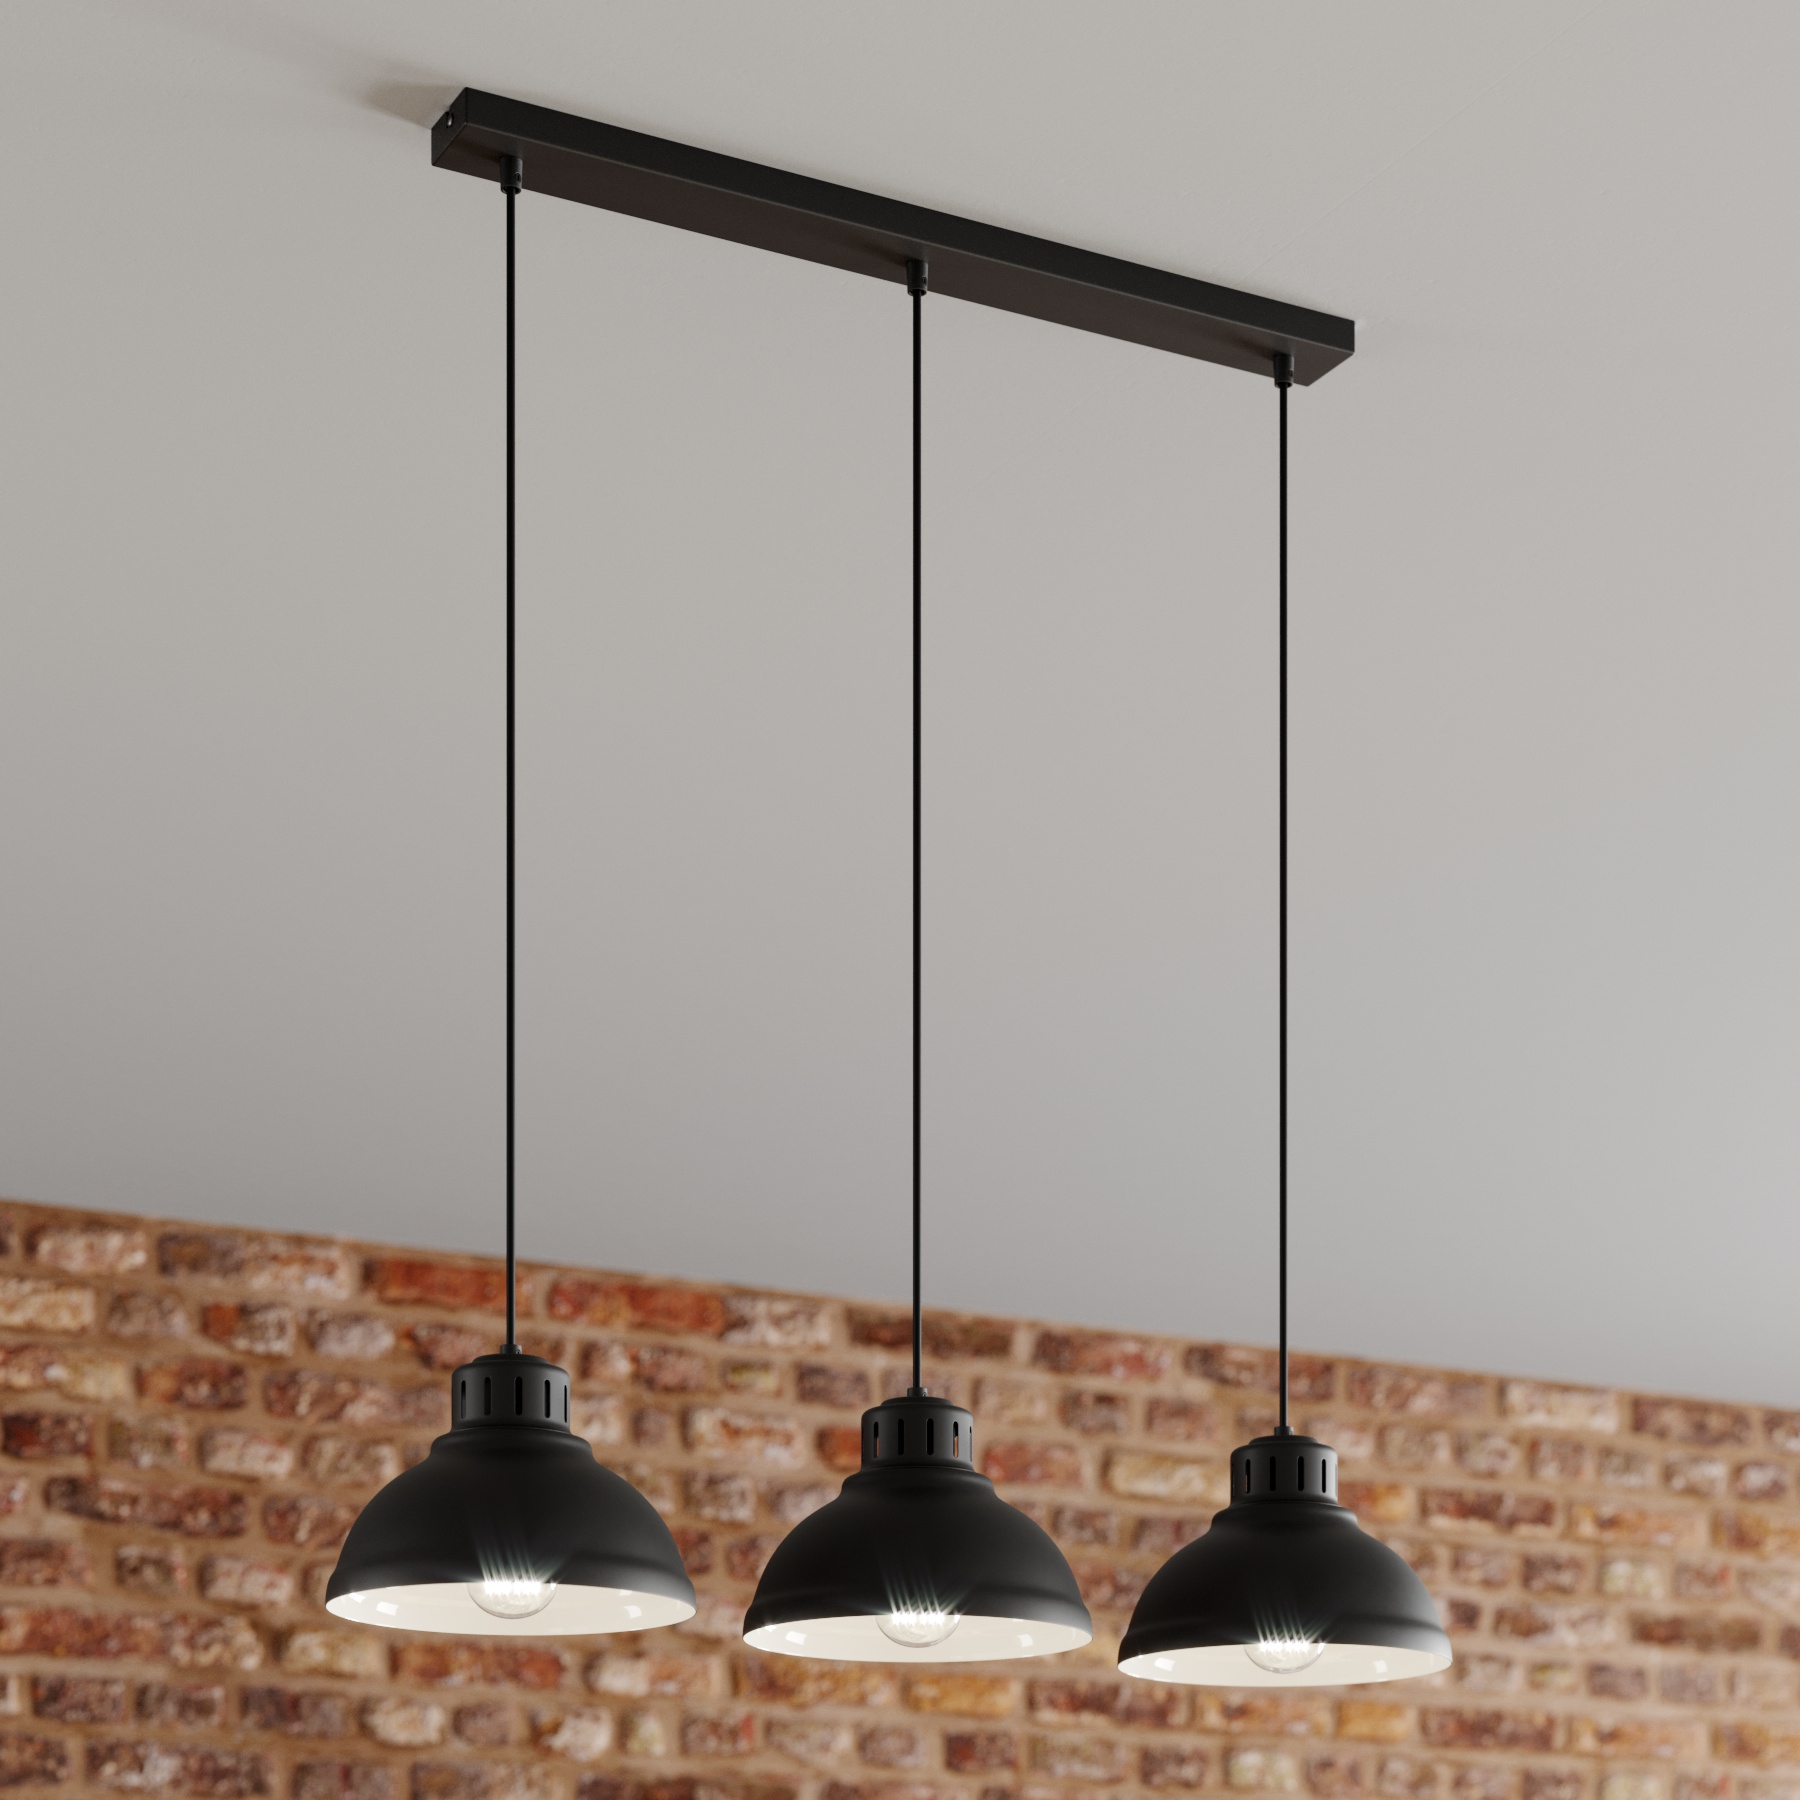 Hanglamp Sven, 3-lamps, zwart